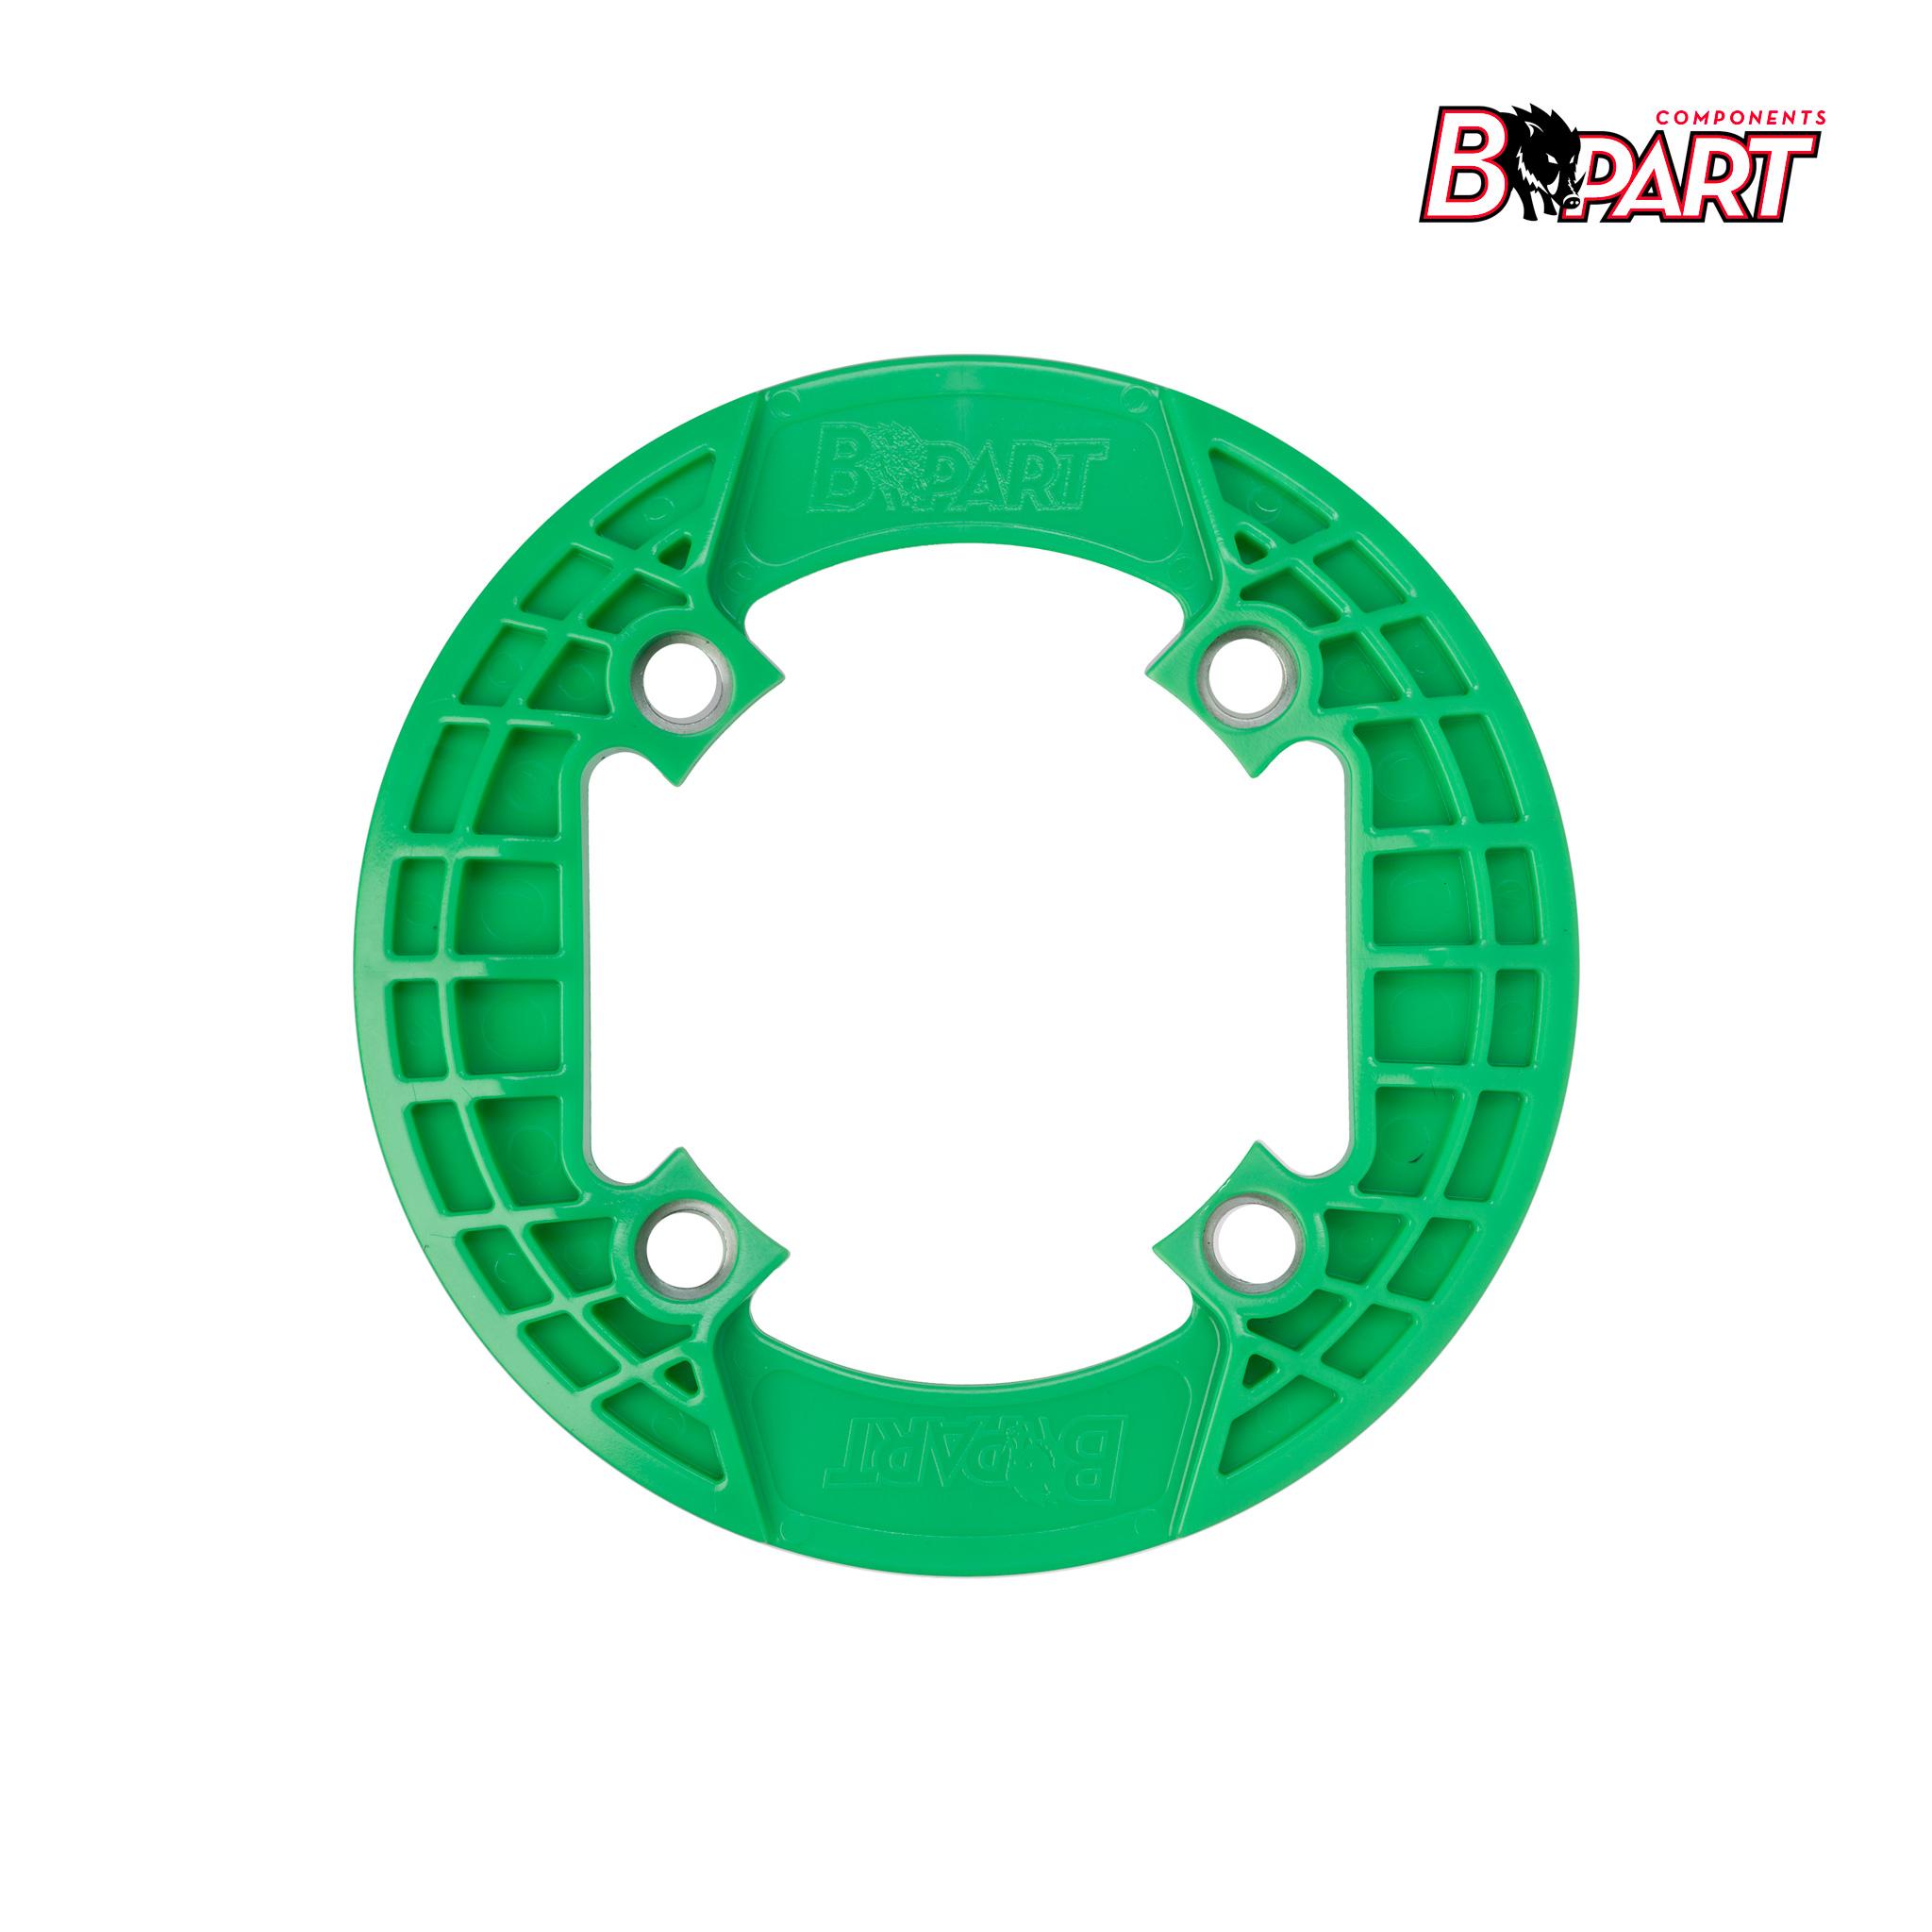 Bpart Components cubreplatos verde